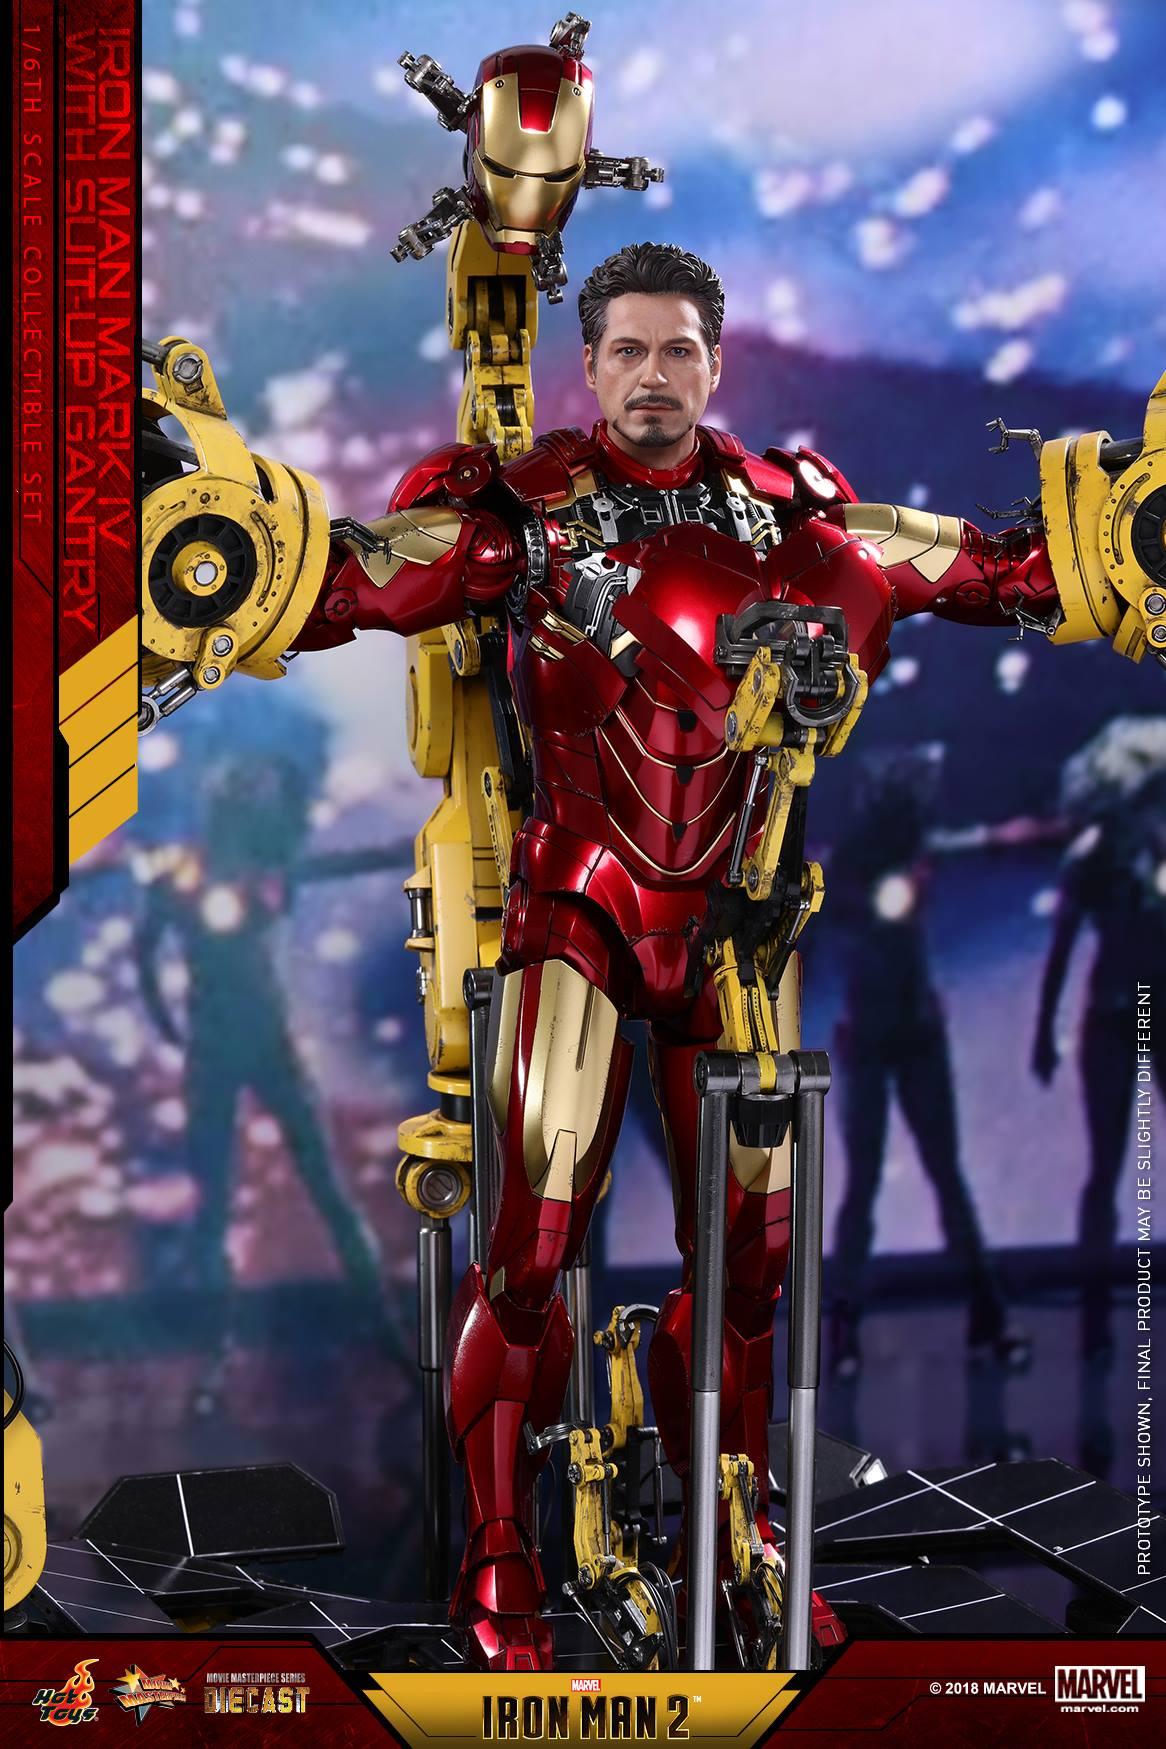 Hot-Toys-Iron-Man-MKIV-with-Gantry-004